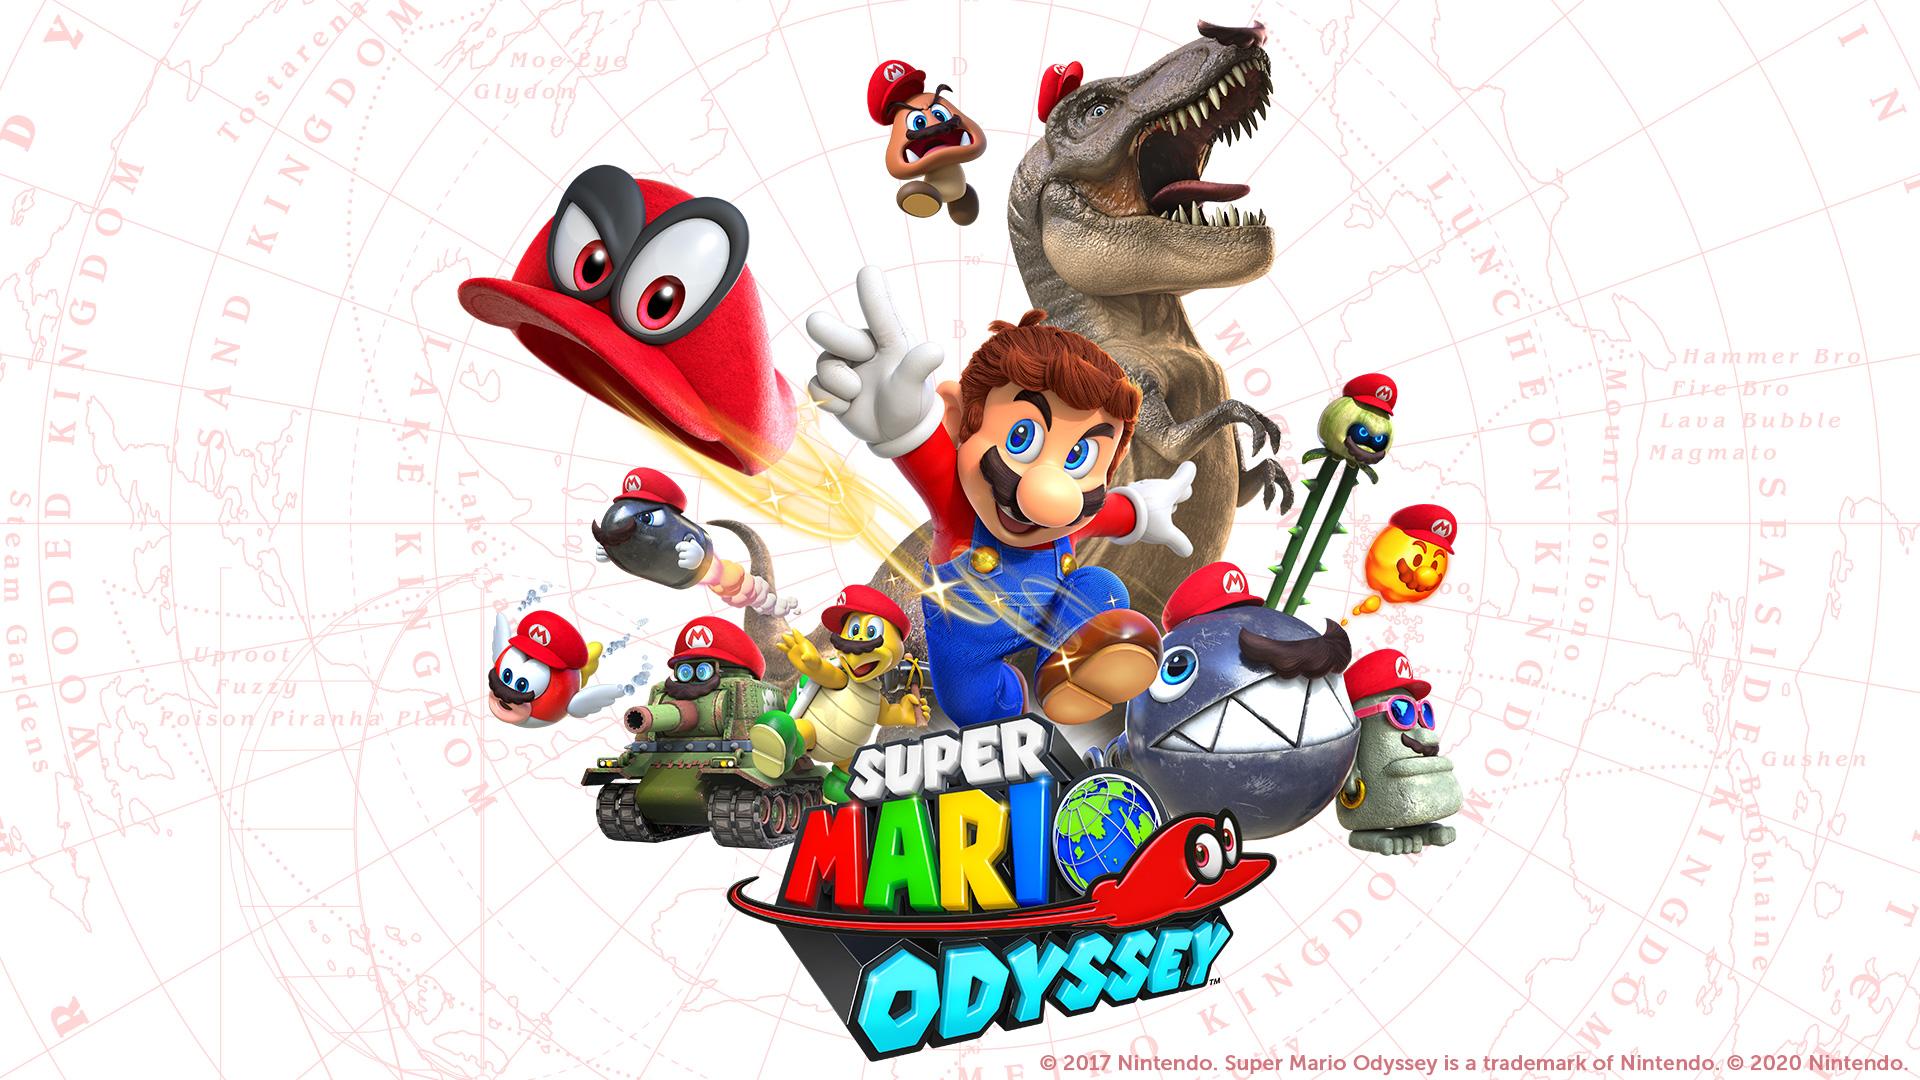 super-mario-odyssey™-desktop-wallpaper.jpeg